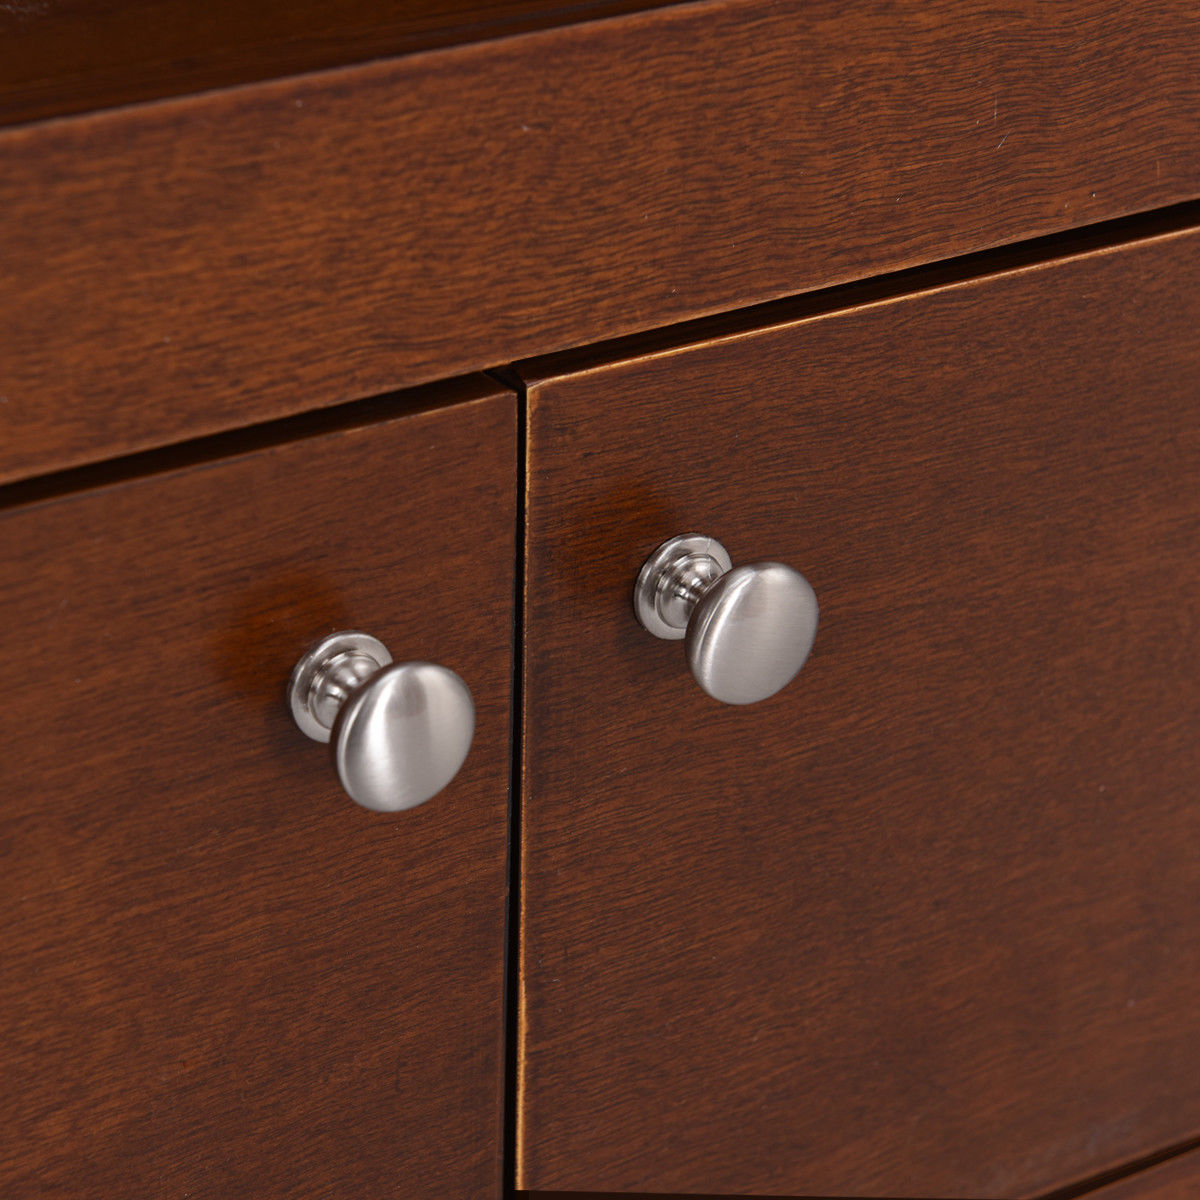 "44"" TV Stand Console Wooden Storage Cabinet Shelf Media Center Stand - image 1 de 9"